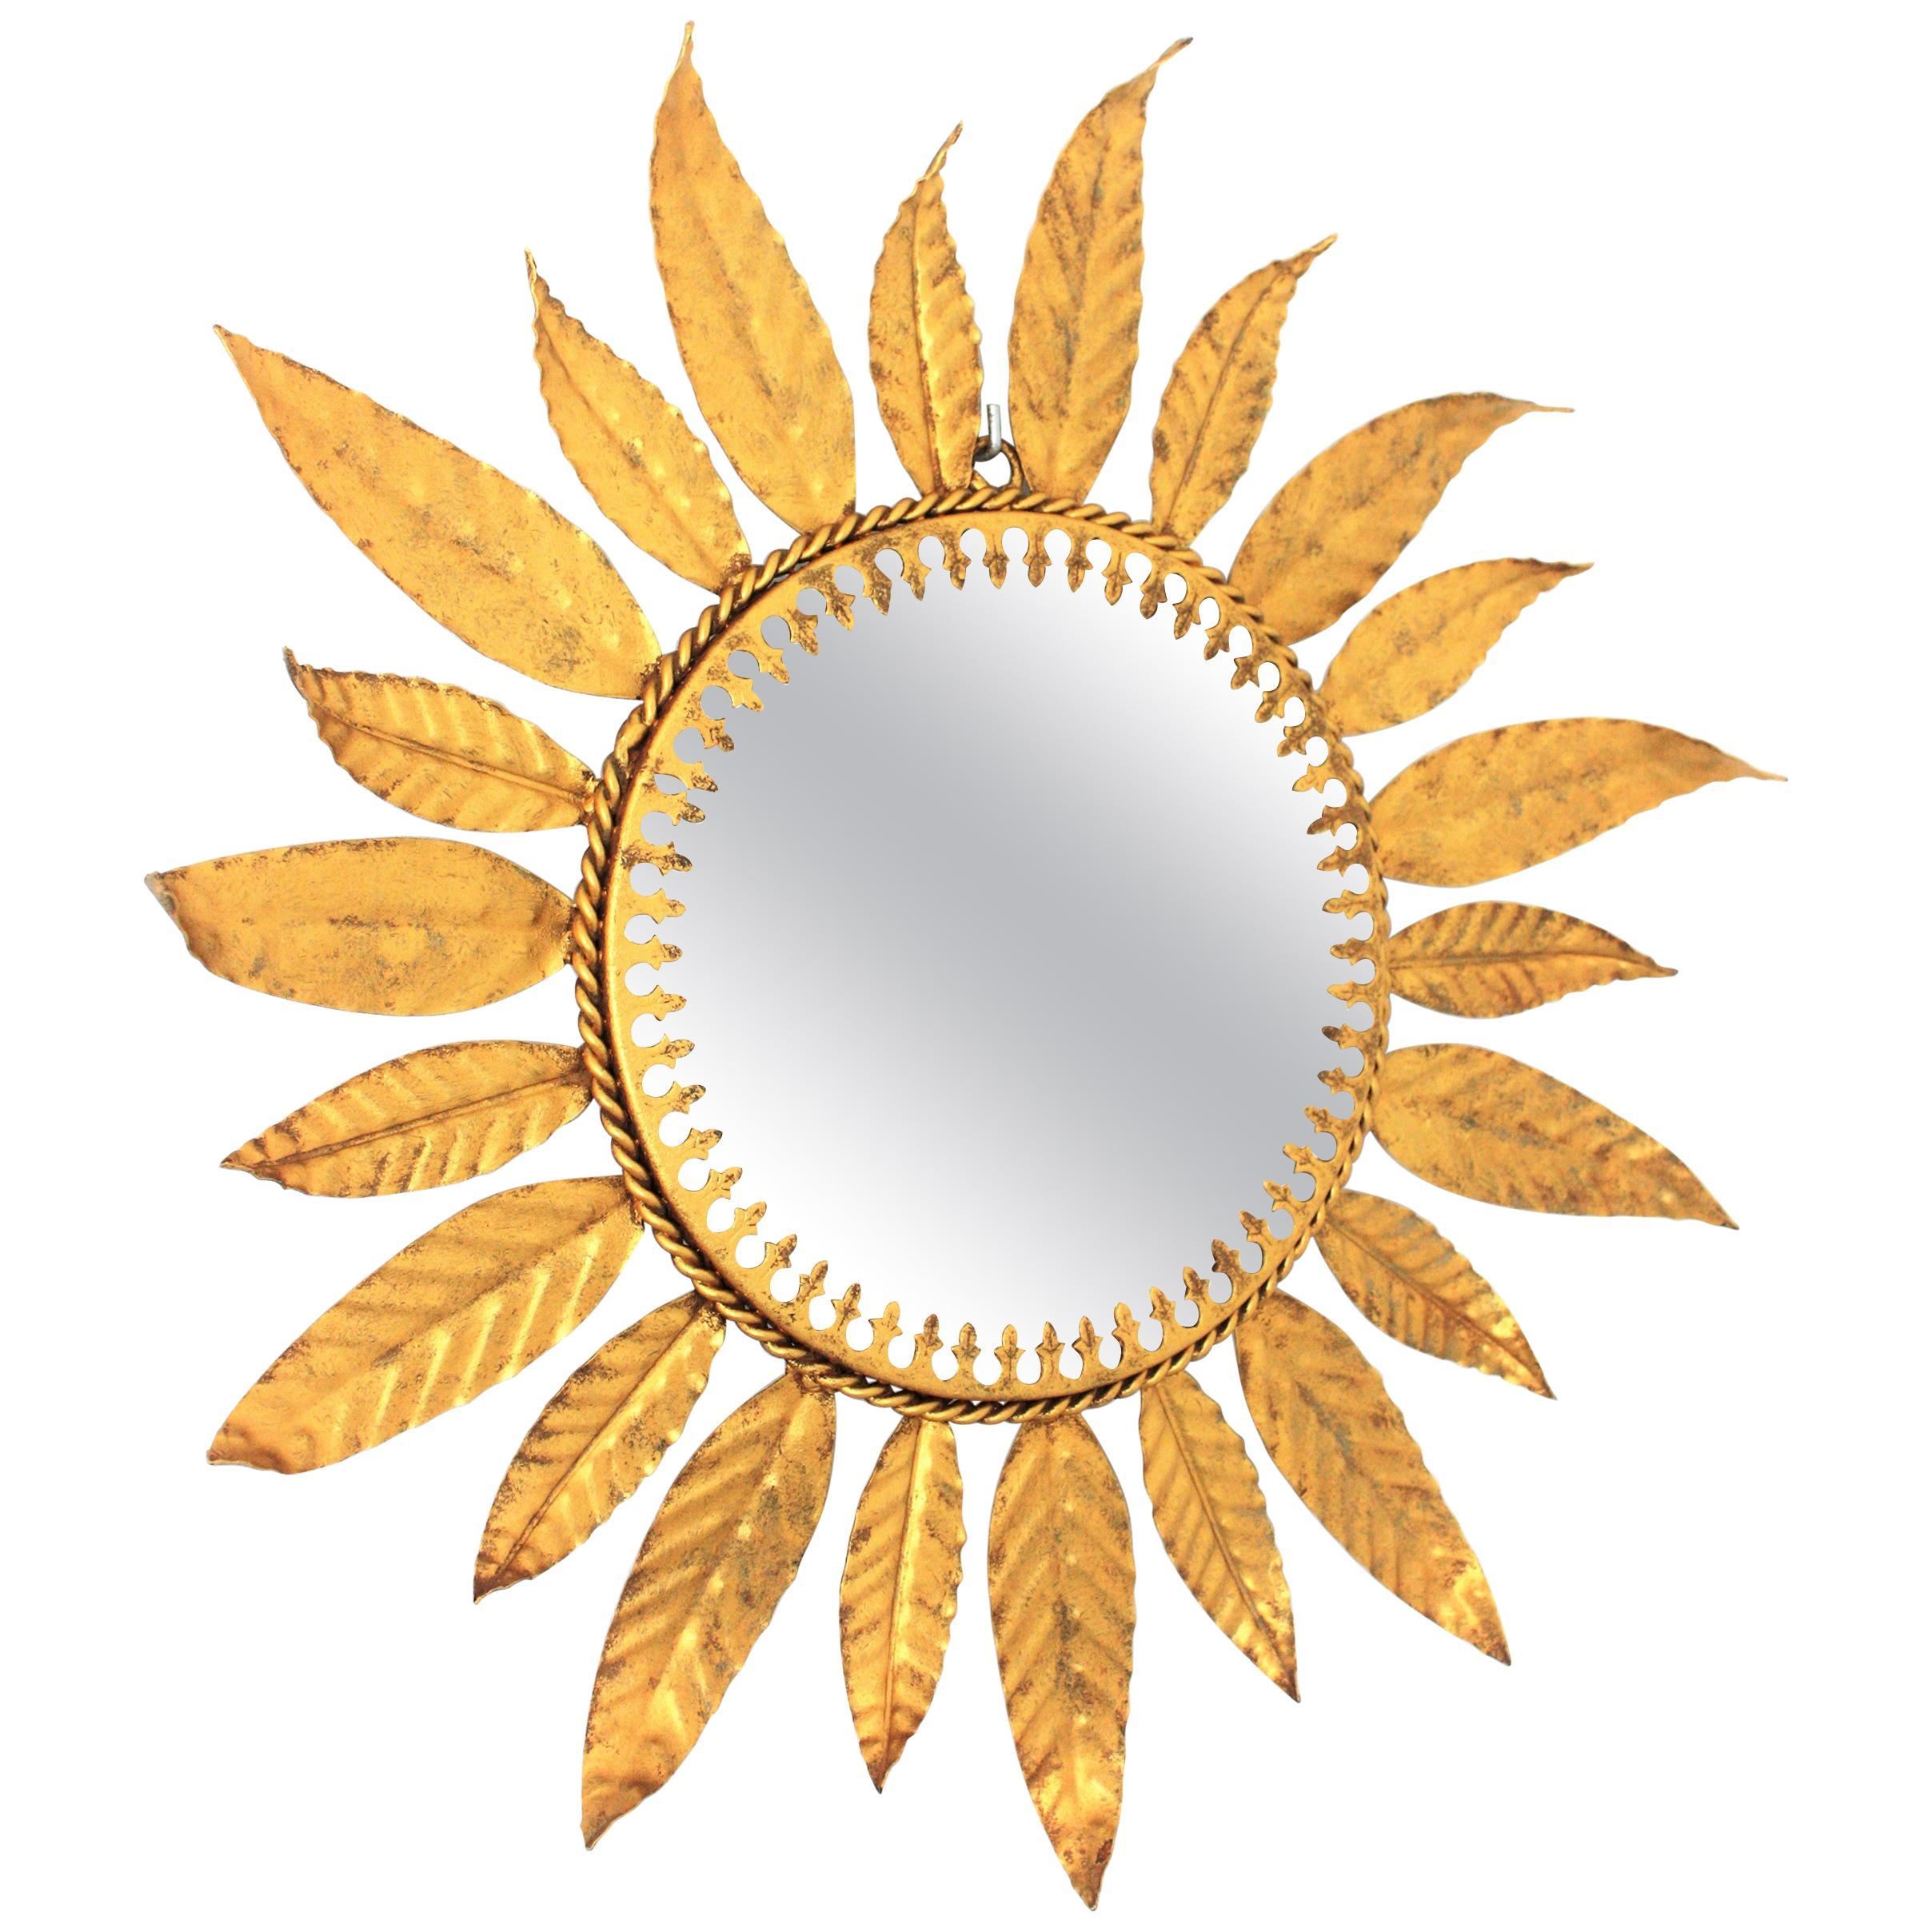 Sunburst Leaves Gilt Metal Mirror, Spain, 1960s